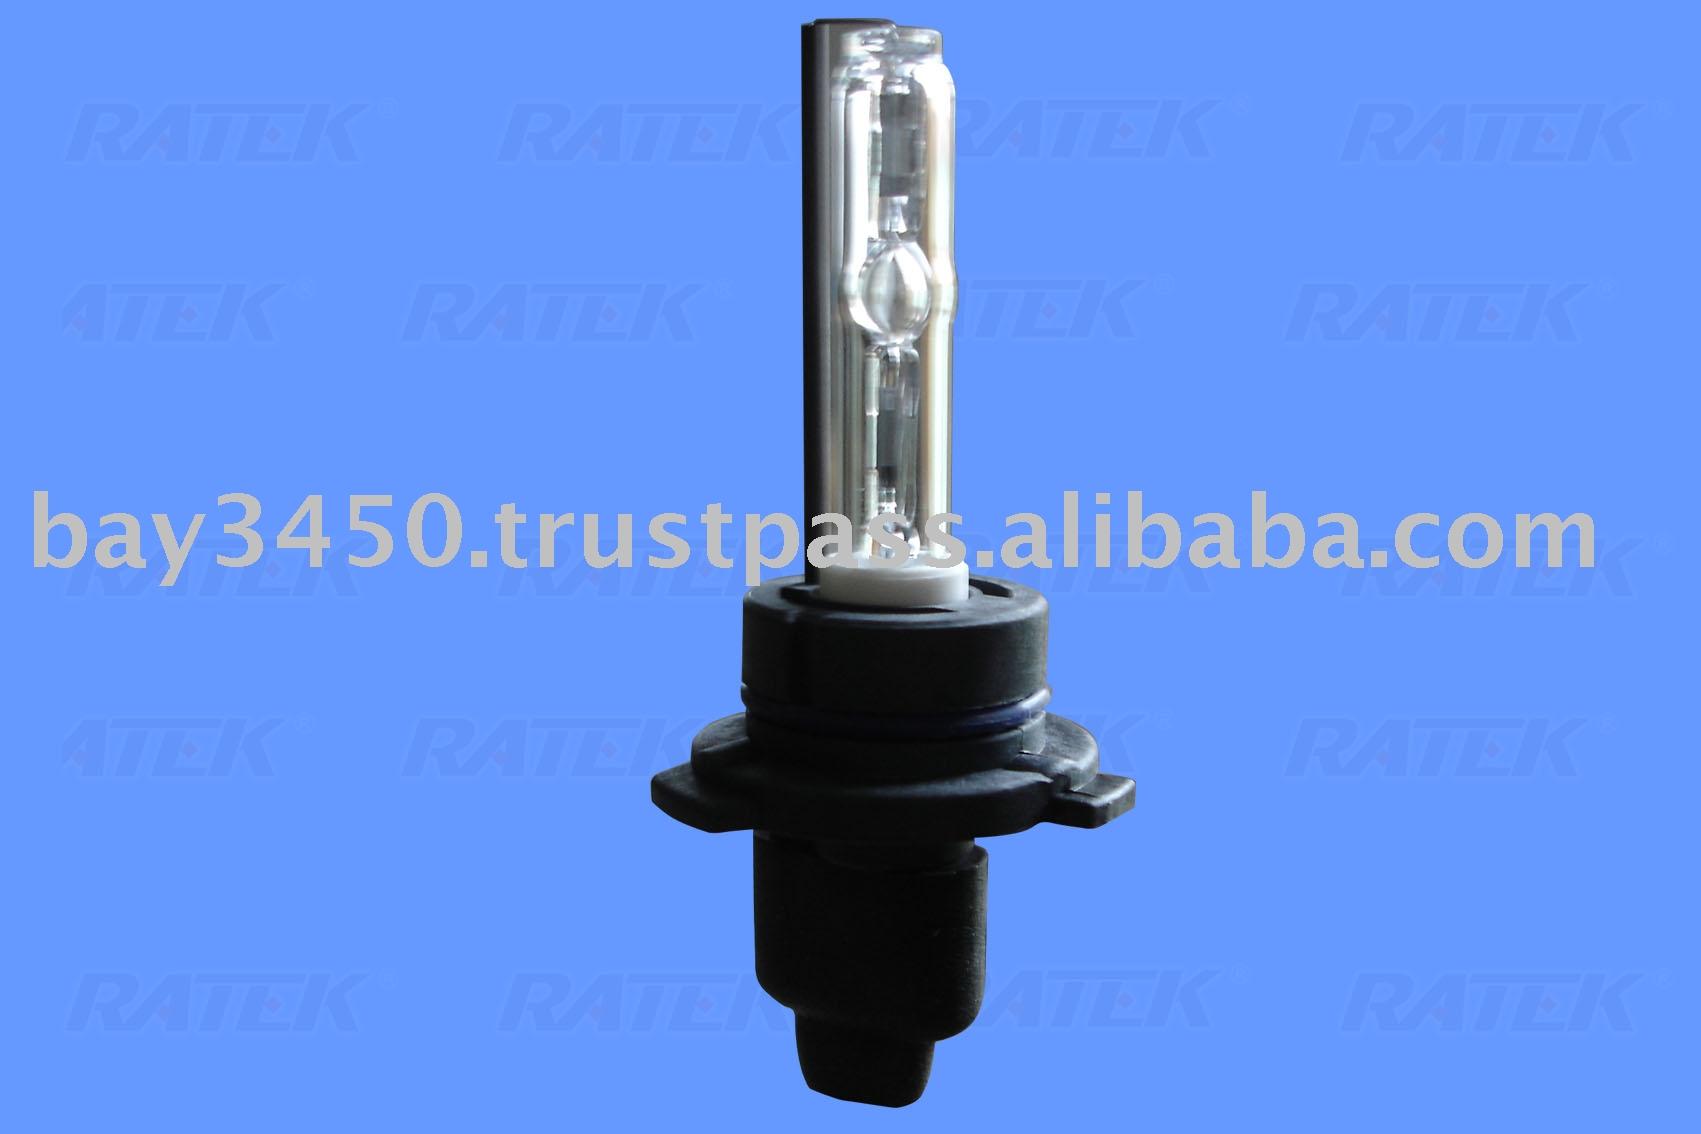 Ratek HID 9006 Hid Xenon Light